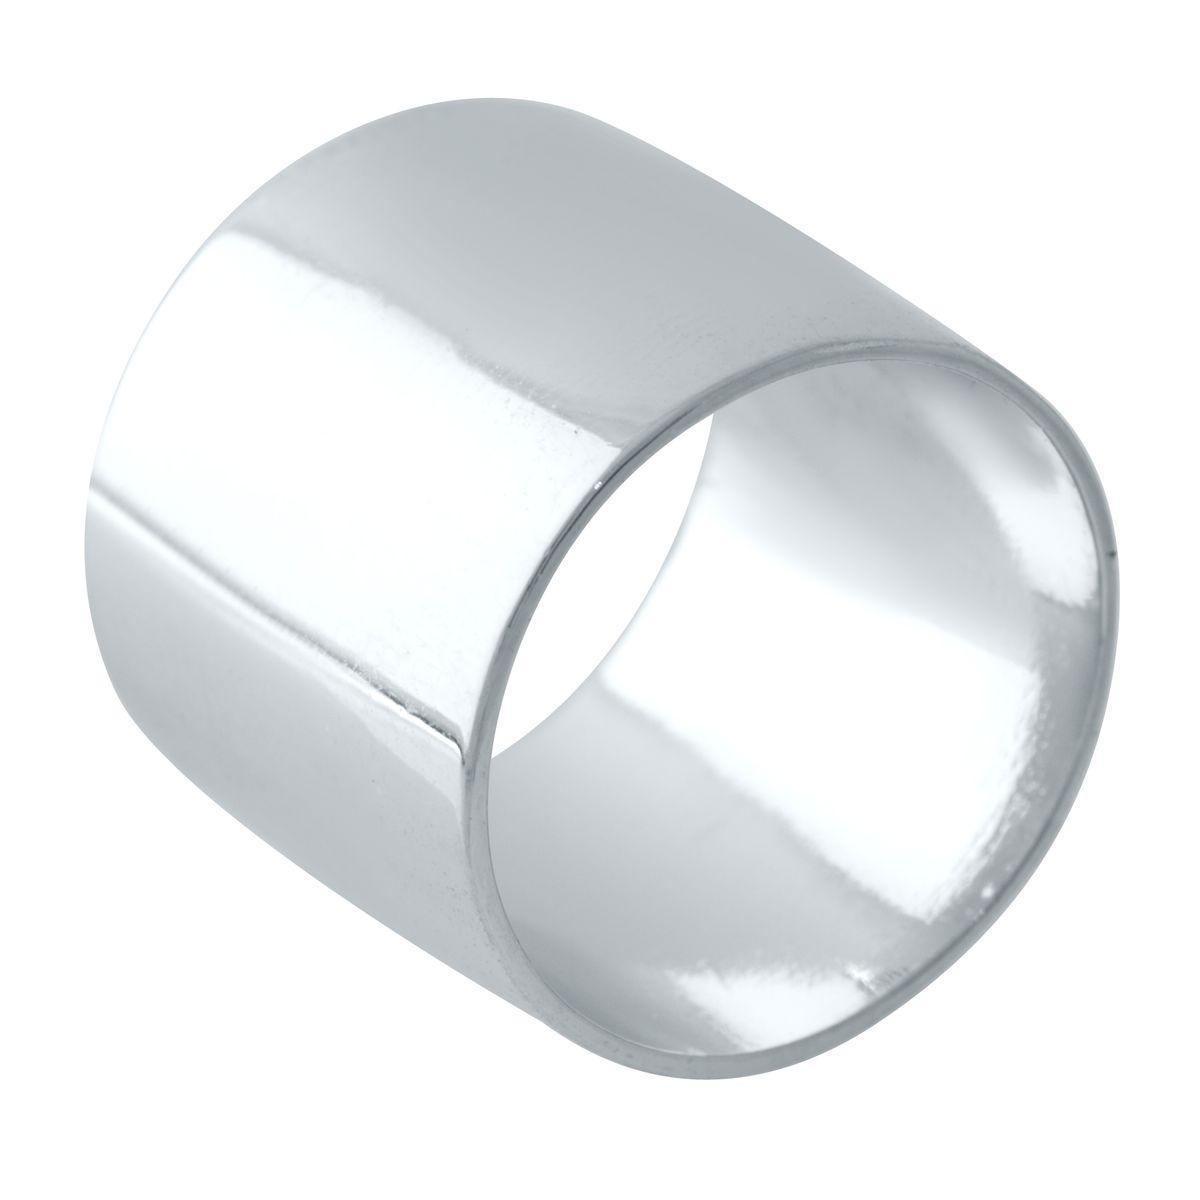 Серебряное кольцо pSilverAlex без камней (2029458) 18 размер 7.17, 16